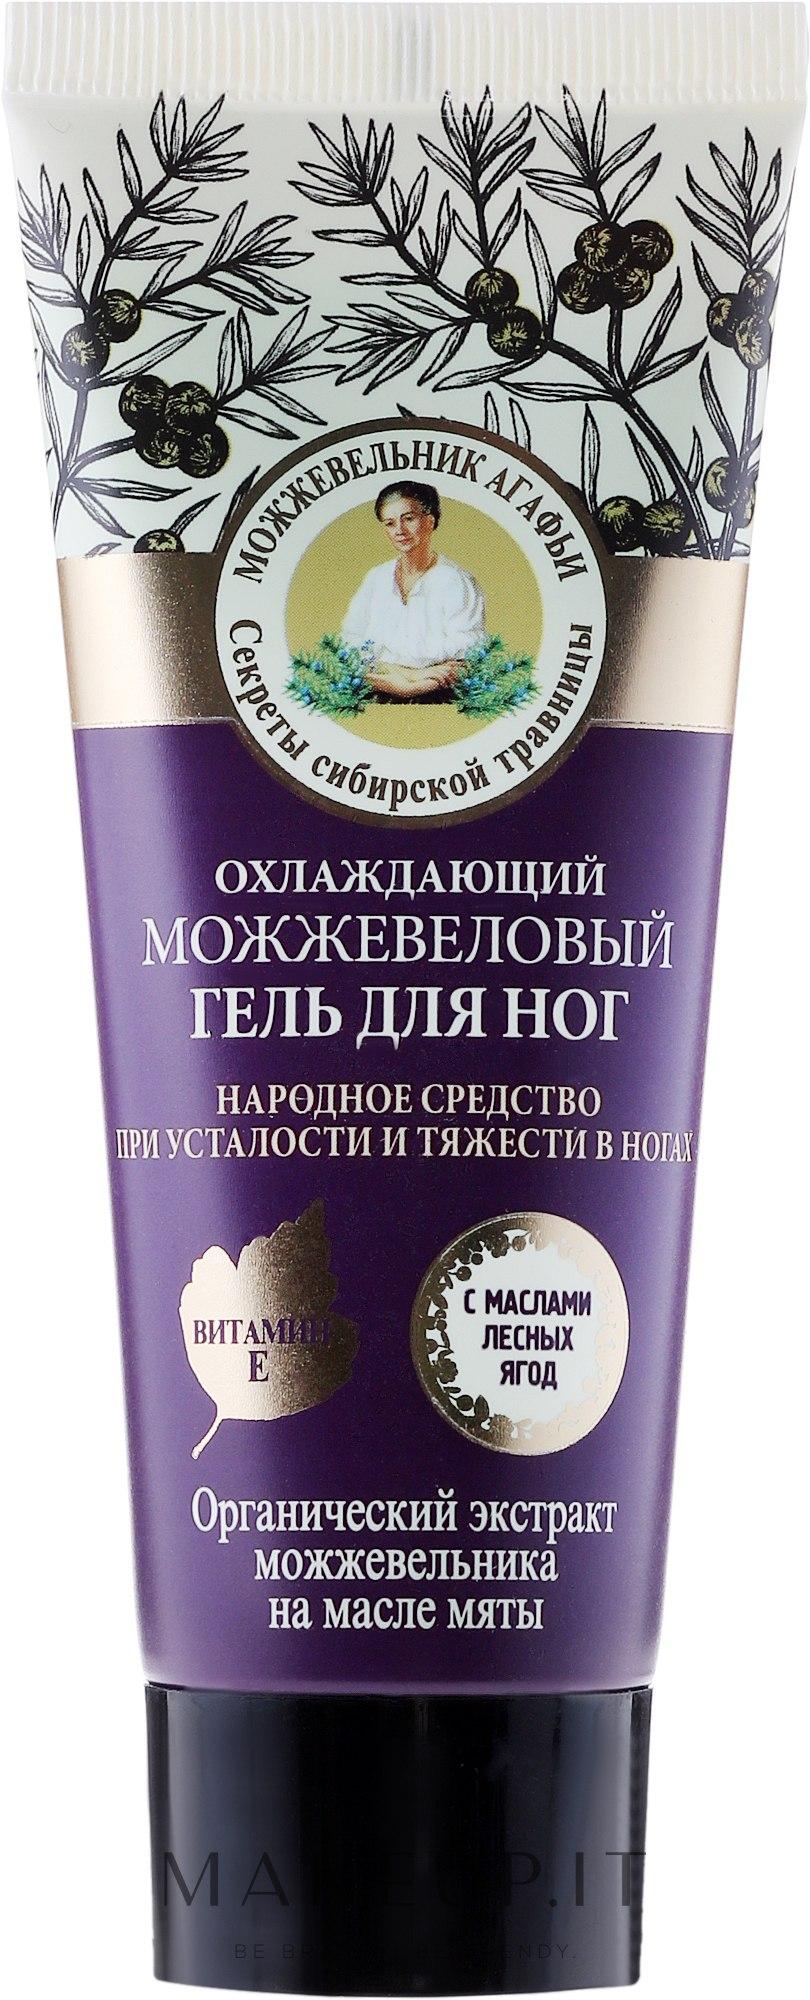 Gel piedi rinfrescante con ginepro - Ricette di nonna Agafya Juniper Foot Gel — foto 75 ml